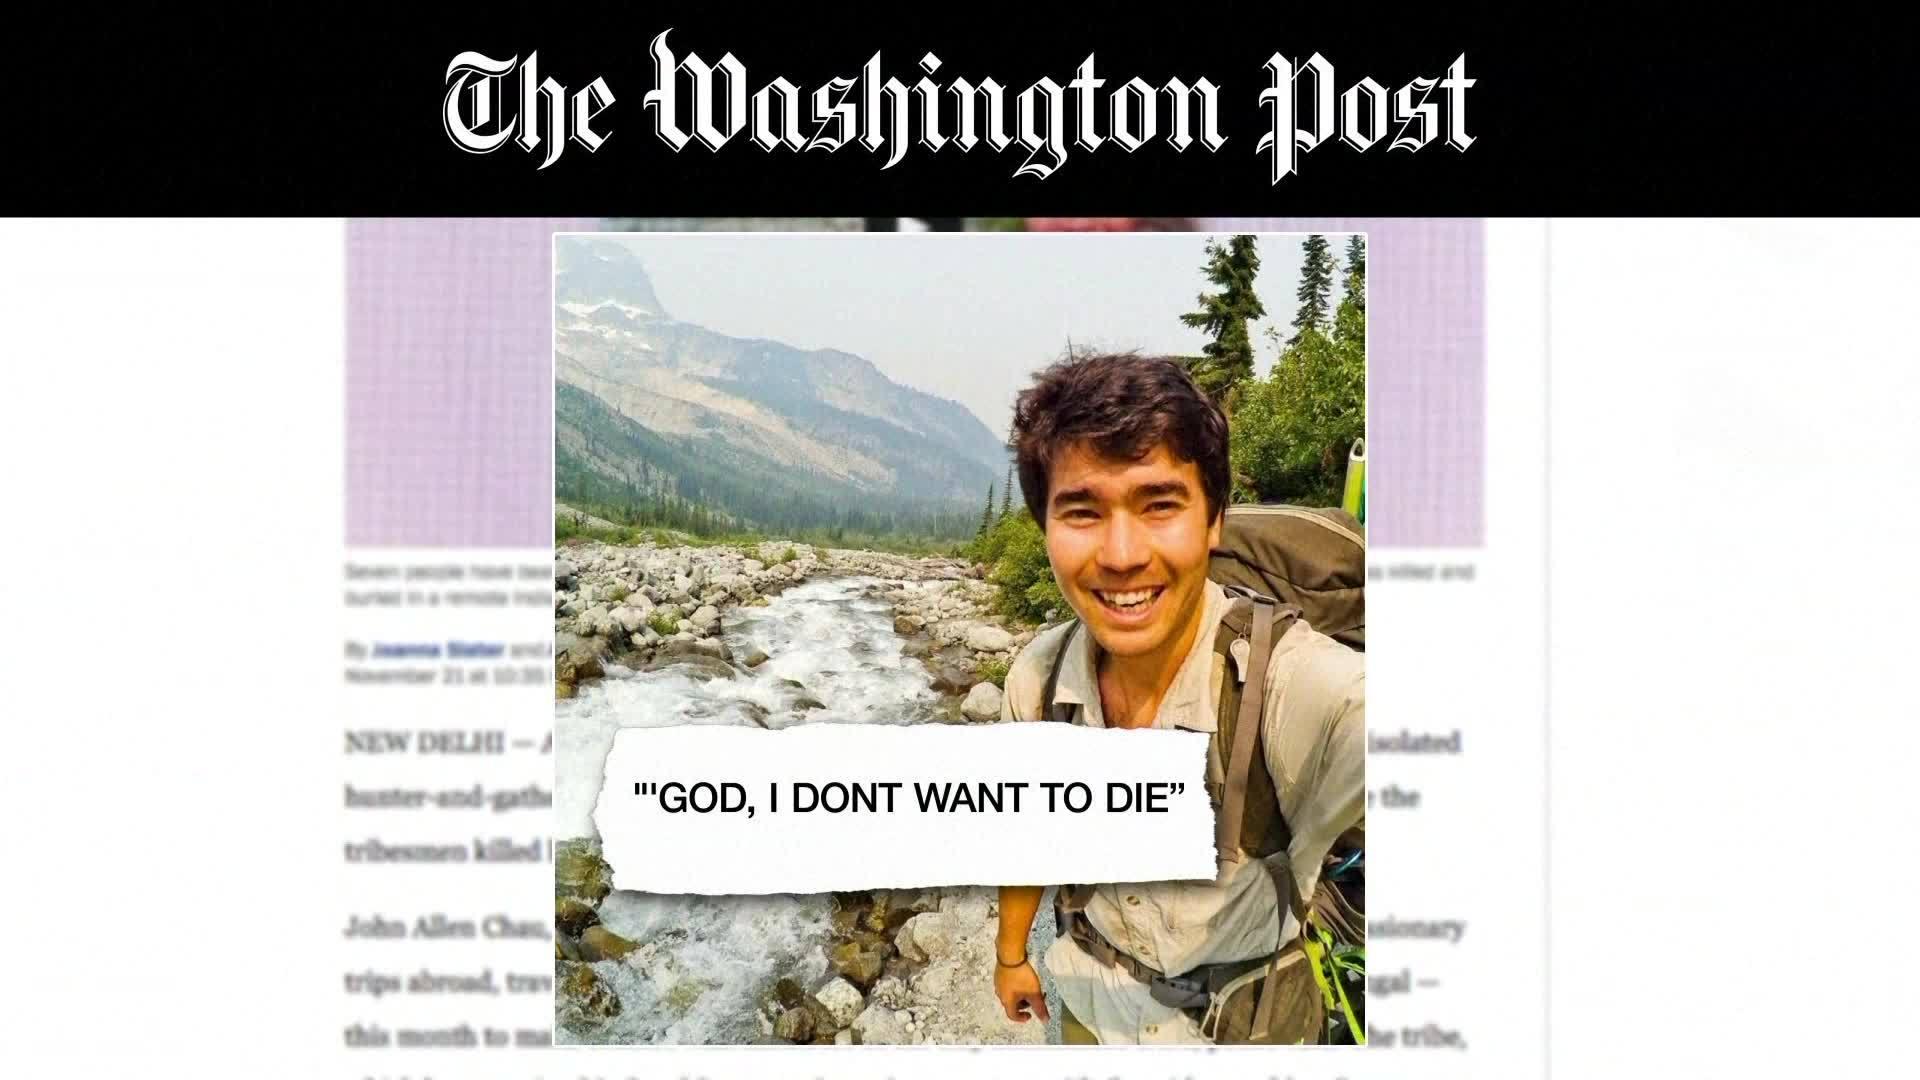 American missionary killed on remote island